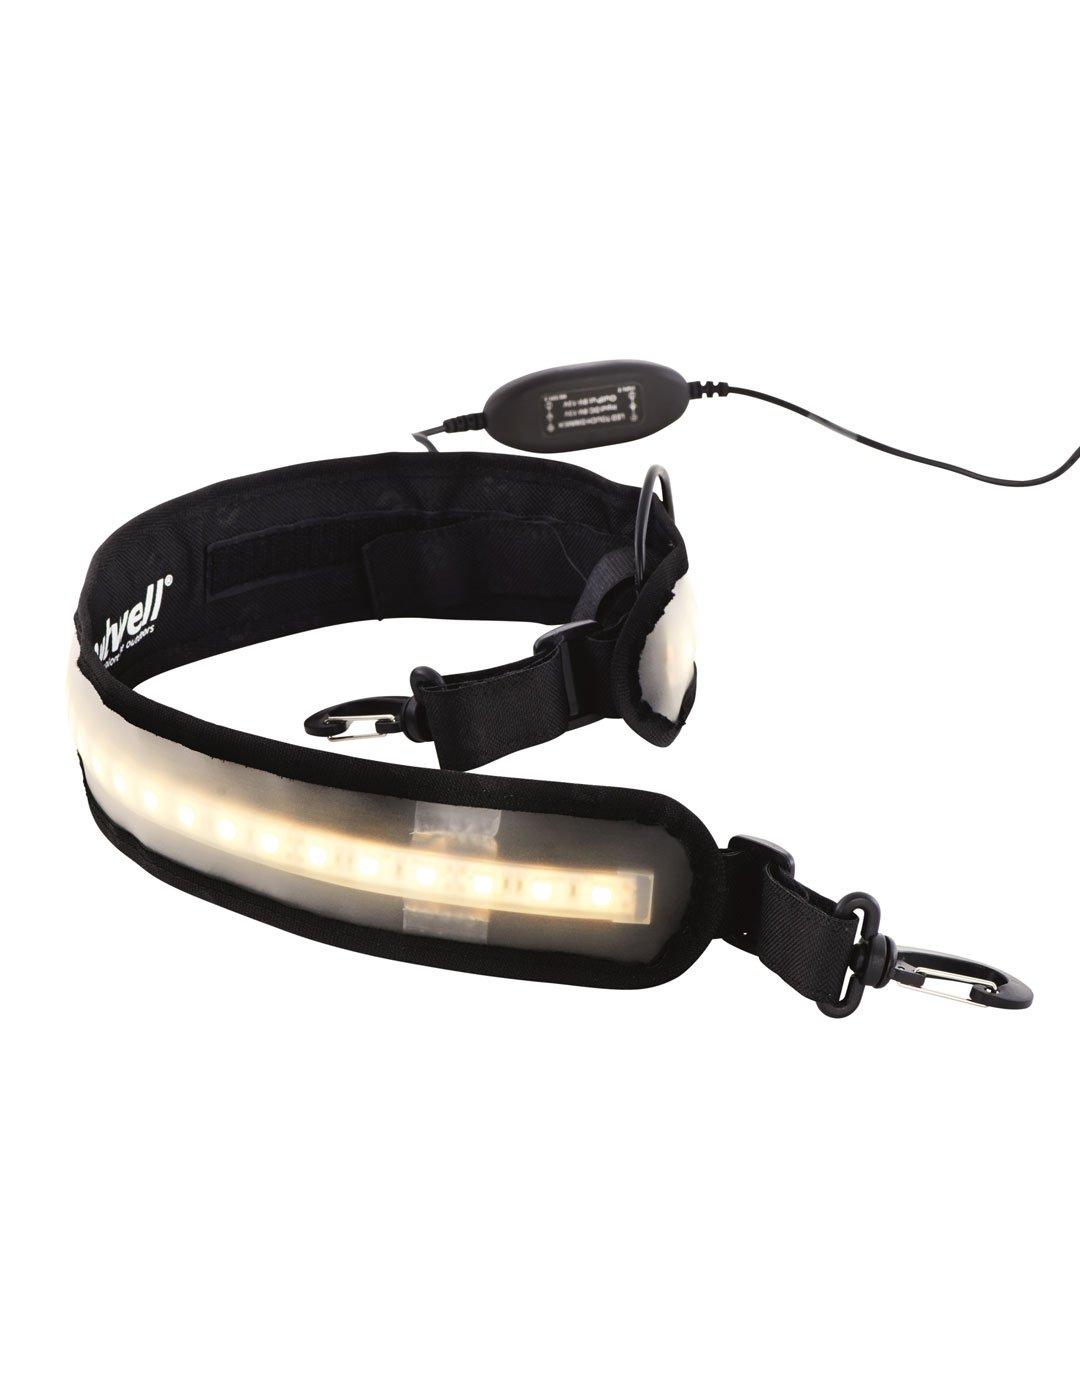 Laternen Outwell Corvus 600 Lampe Lampen & Laternen